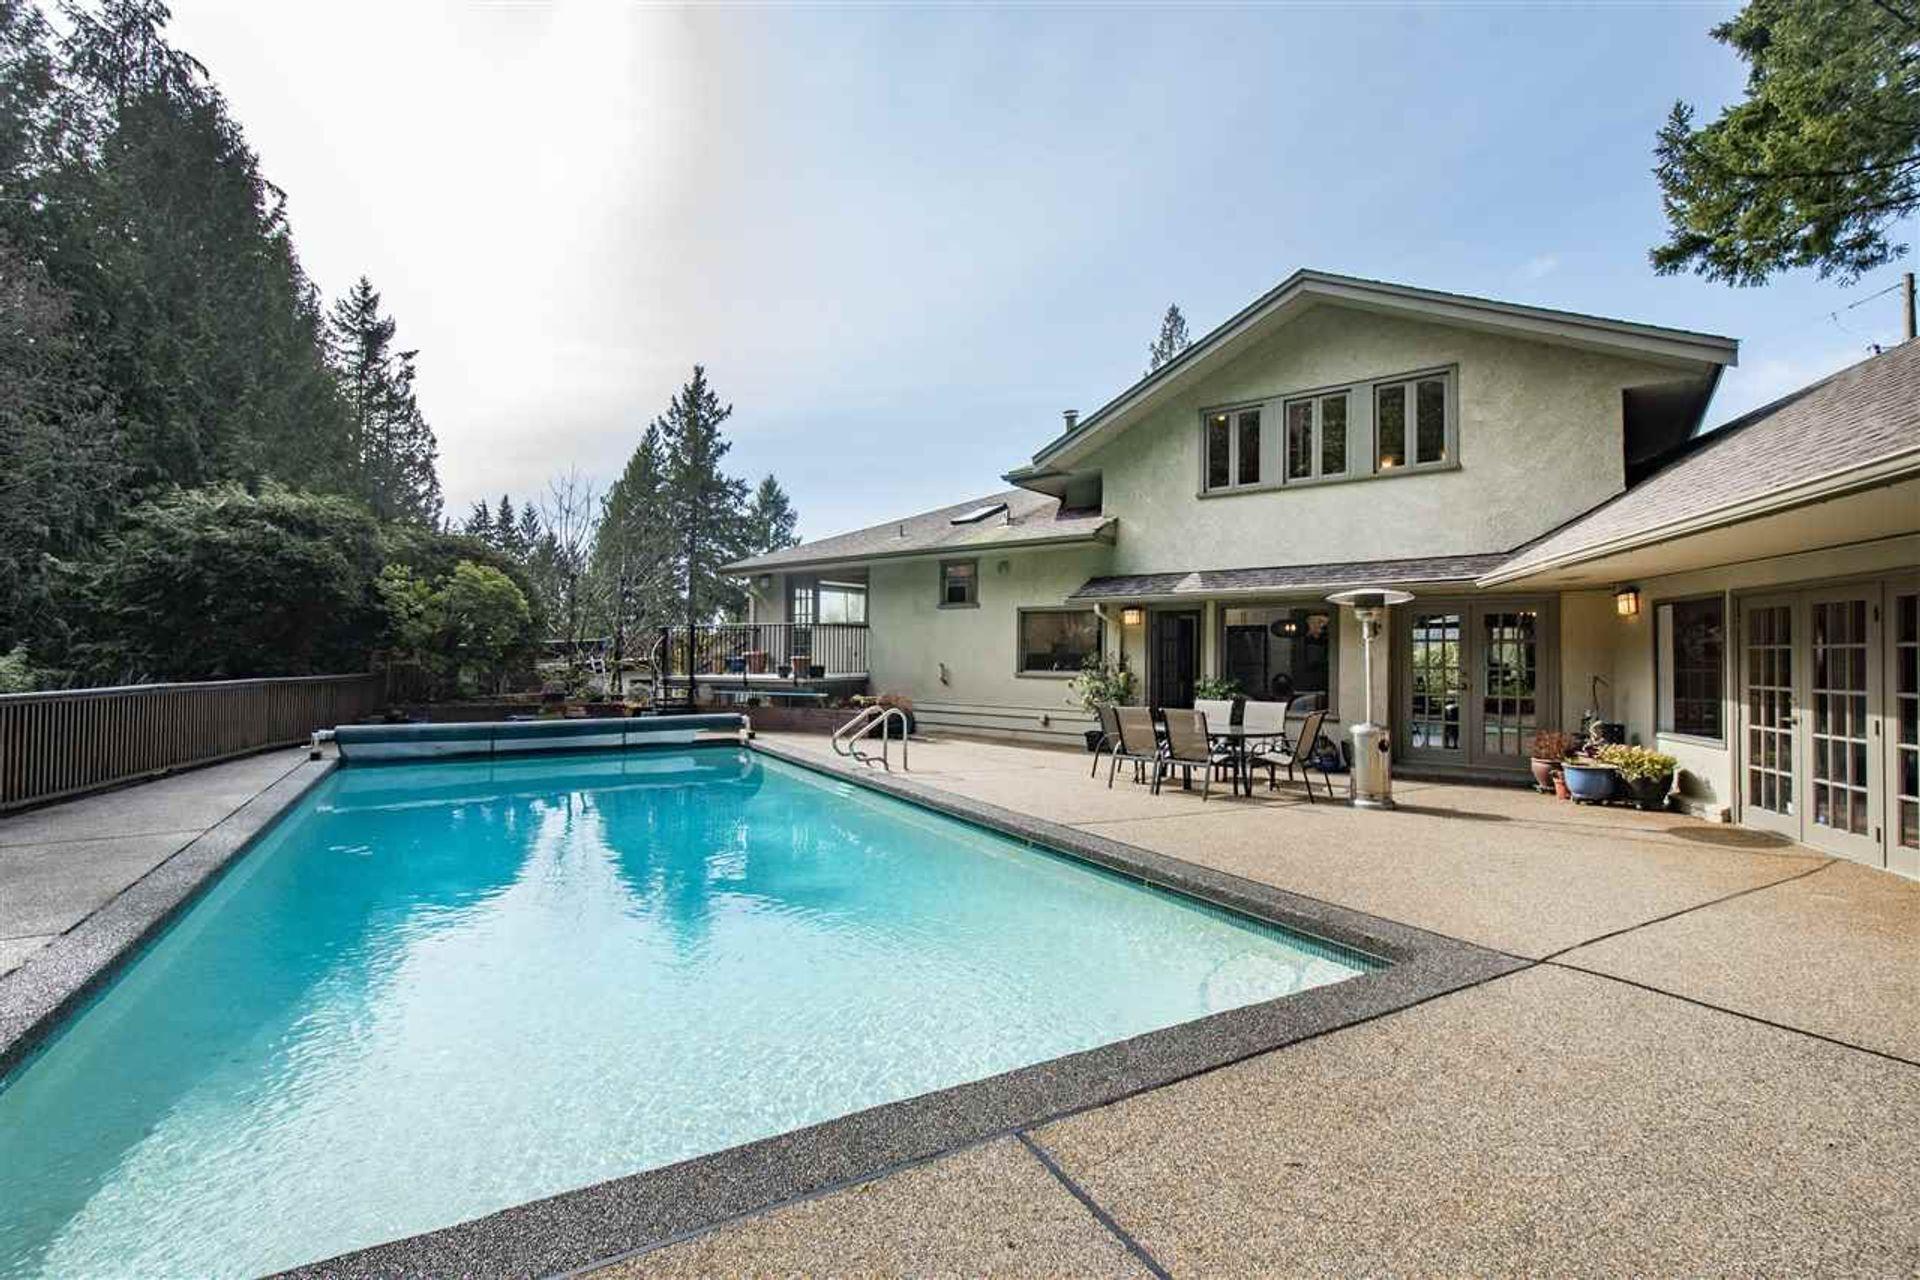 4488-skyline-drive-canyon-heights-nv-north-vancouver-14 at 4488 Skyline Drive, Canyon Heights NV, North Vancouver